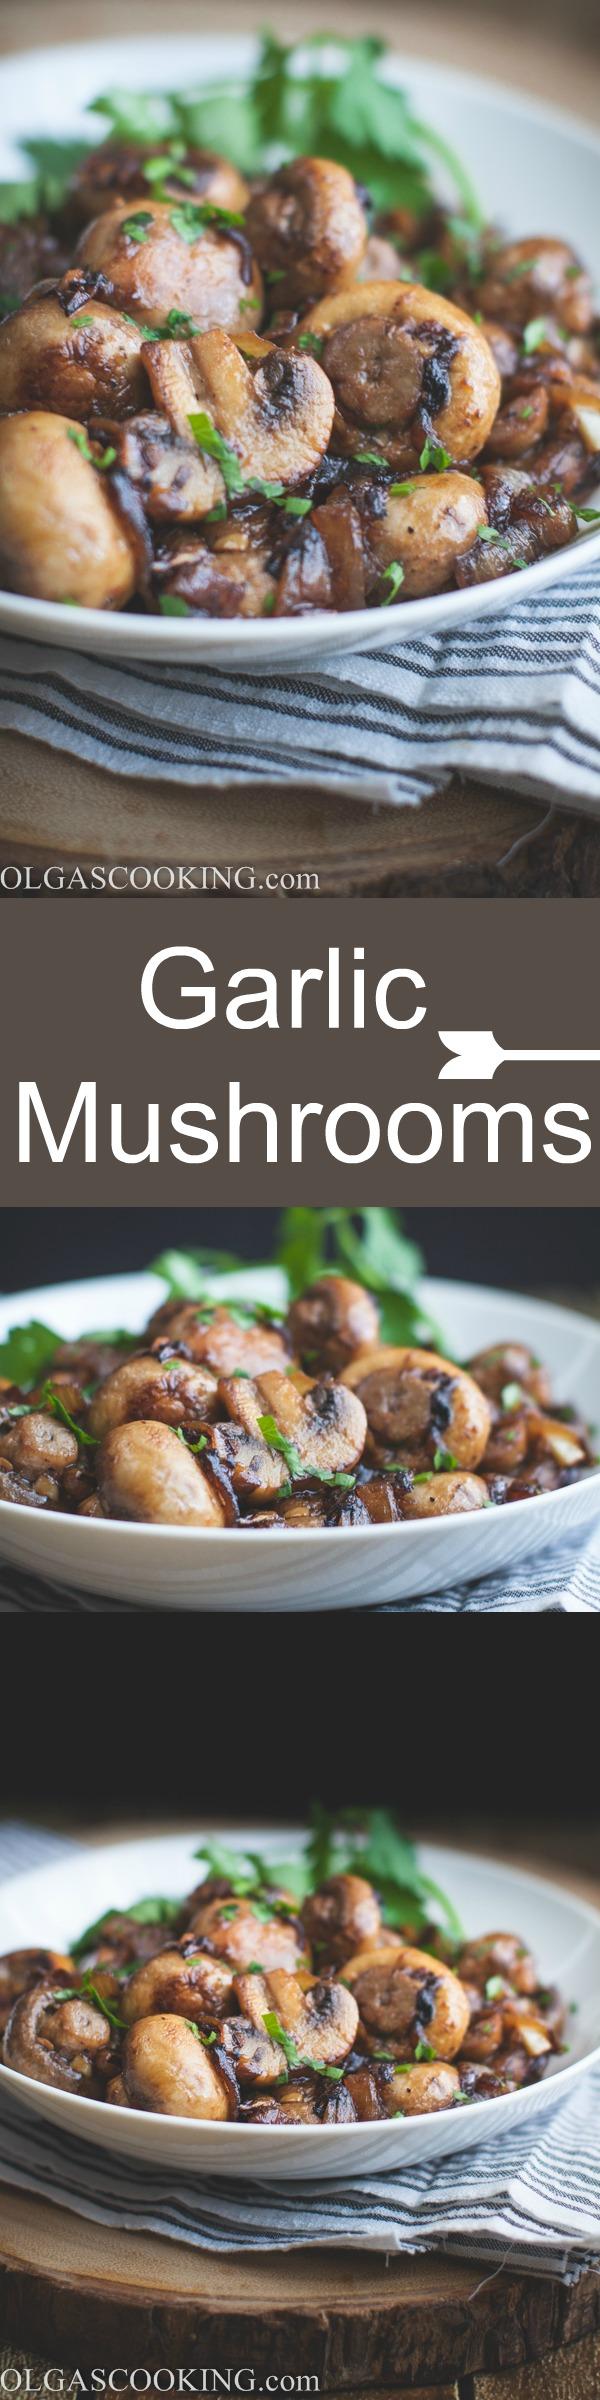 Garlic Mushrooms-perfect, simple, juicy!